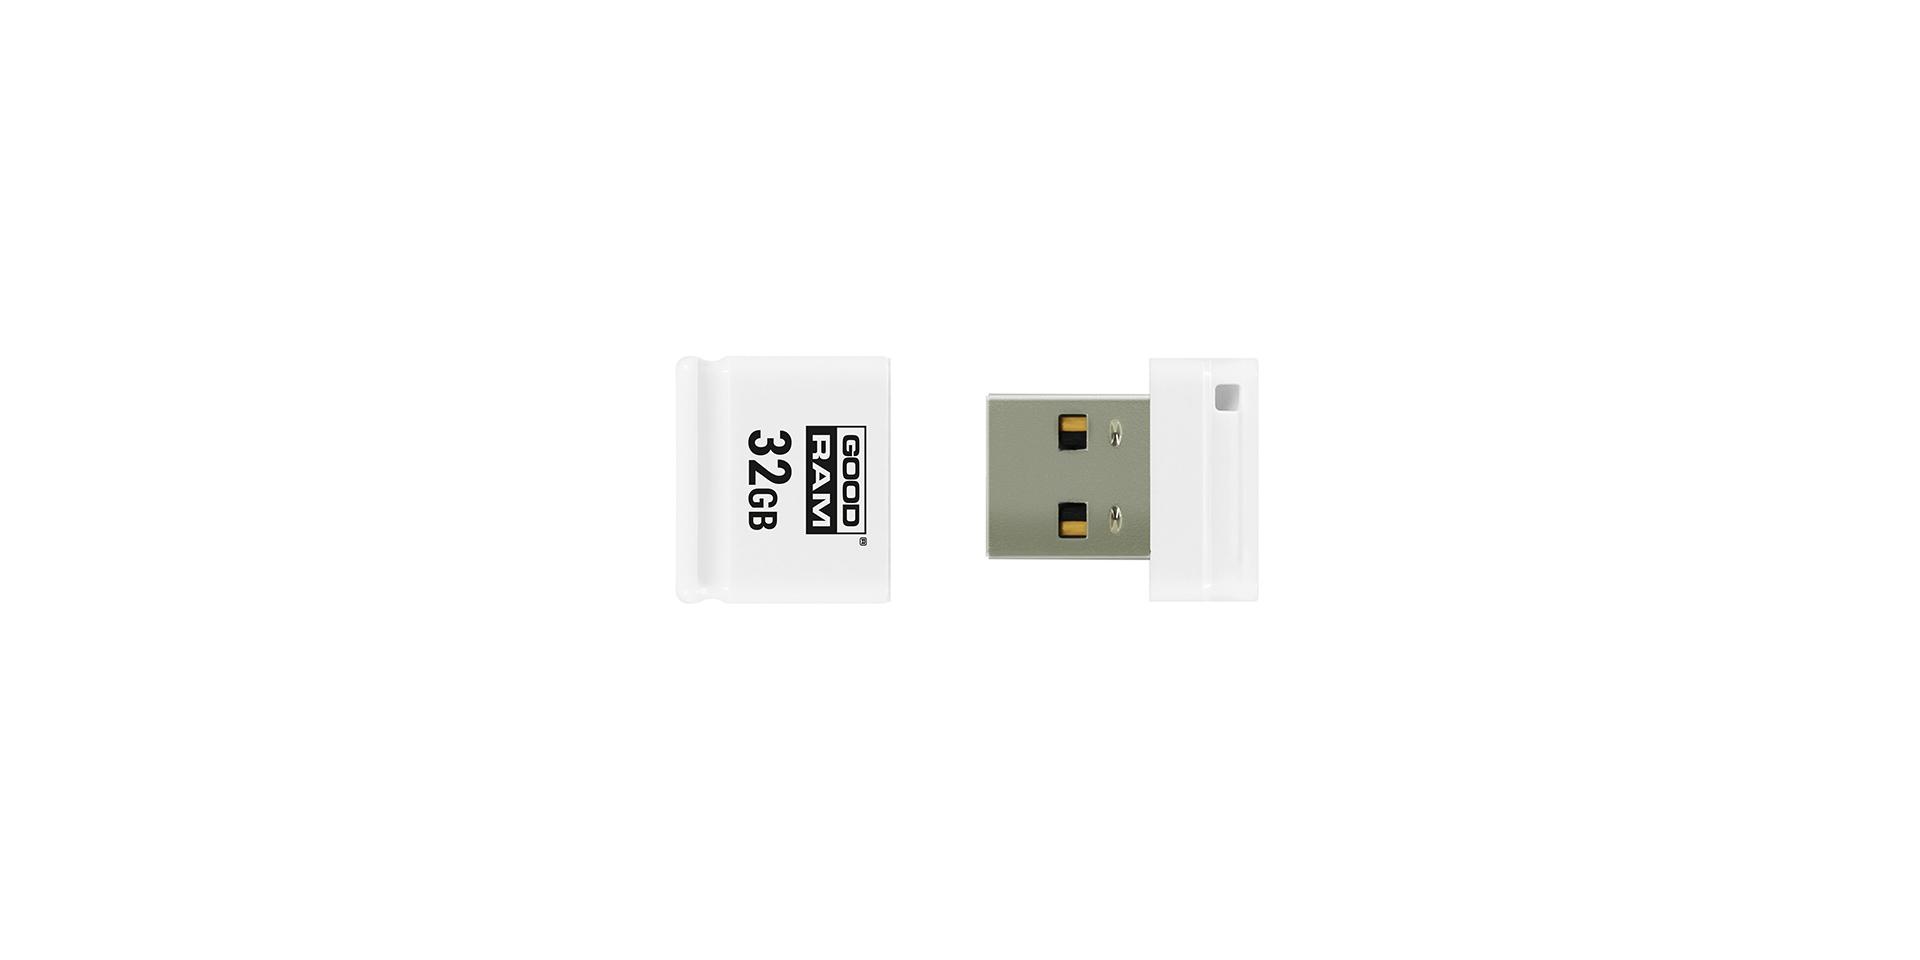 UPI USB 2.0